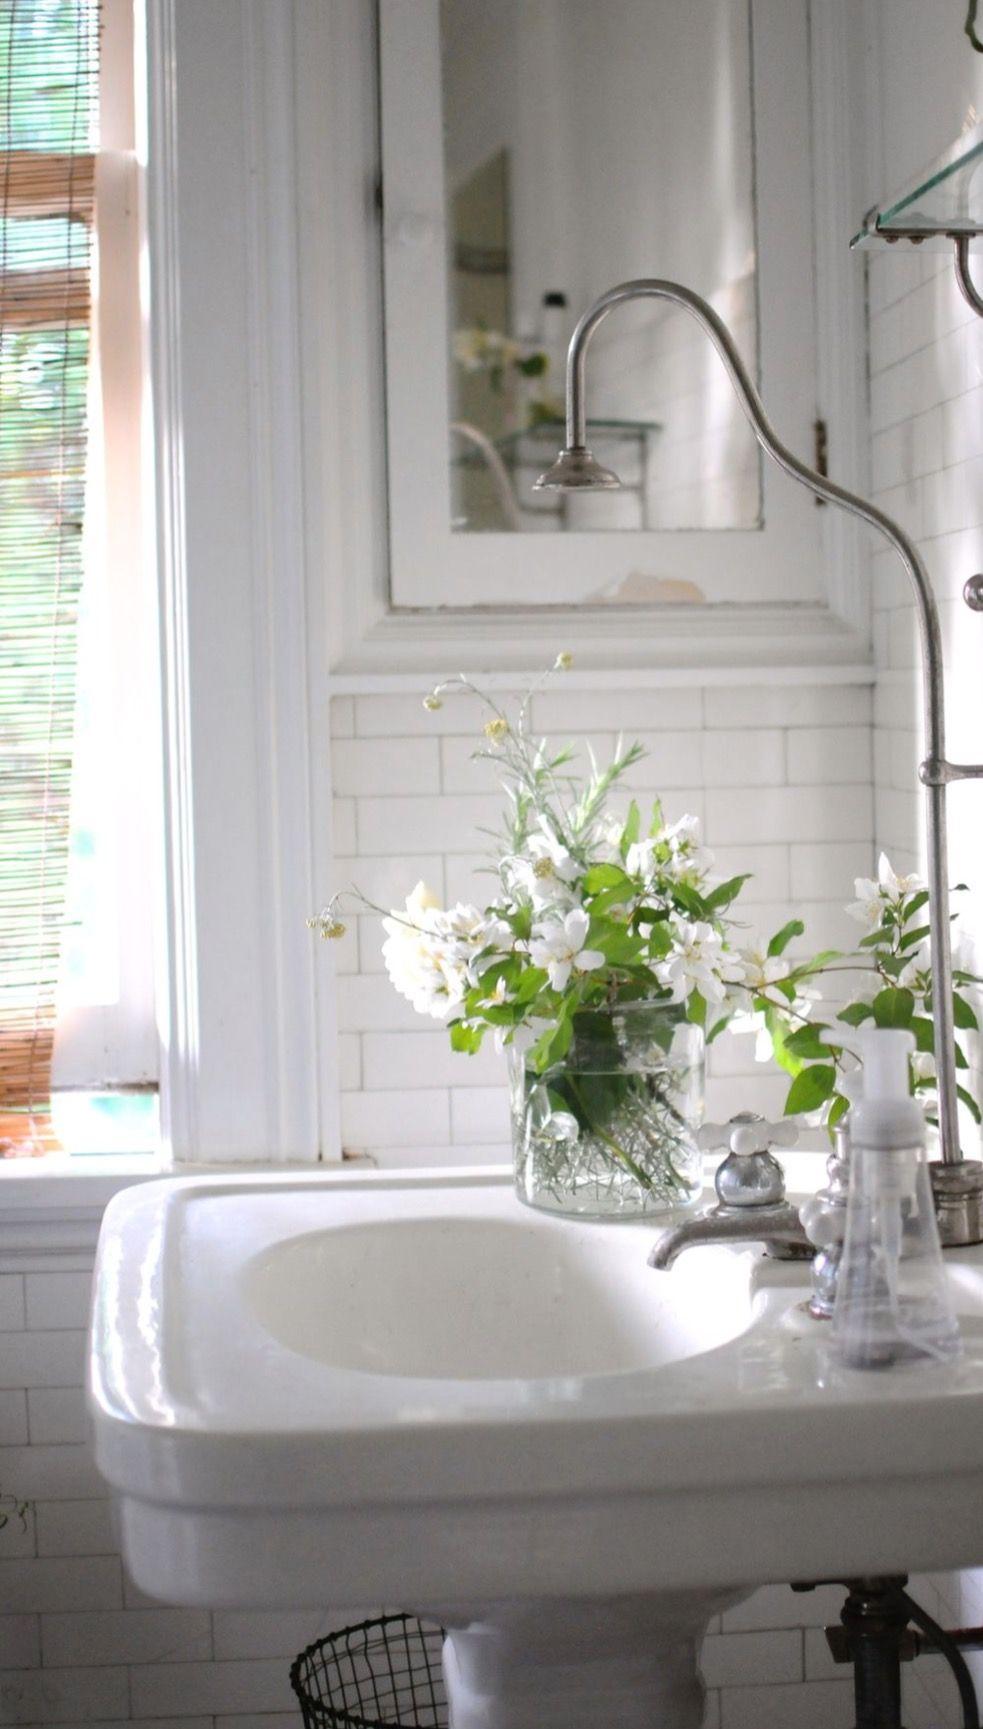 White On White Powder Room | Powder Room ldeas. | Pinterest | Powder ...